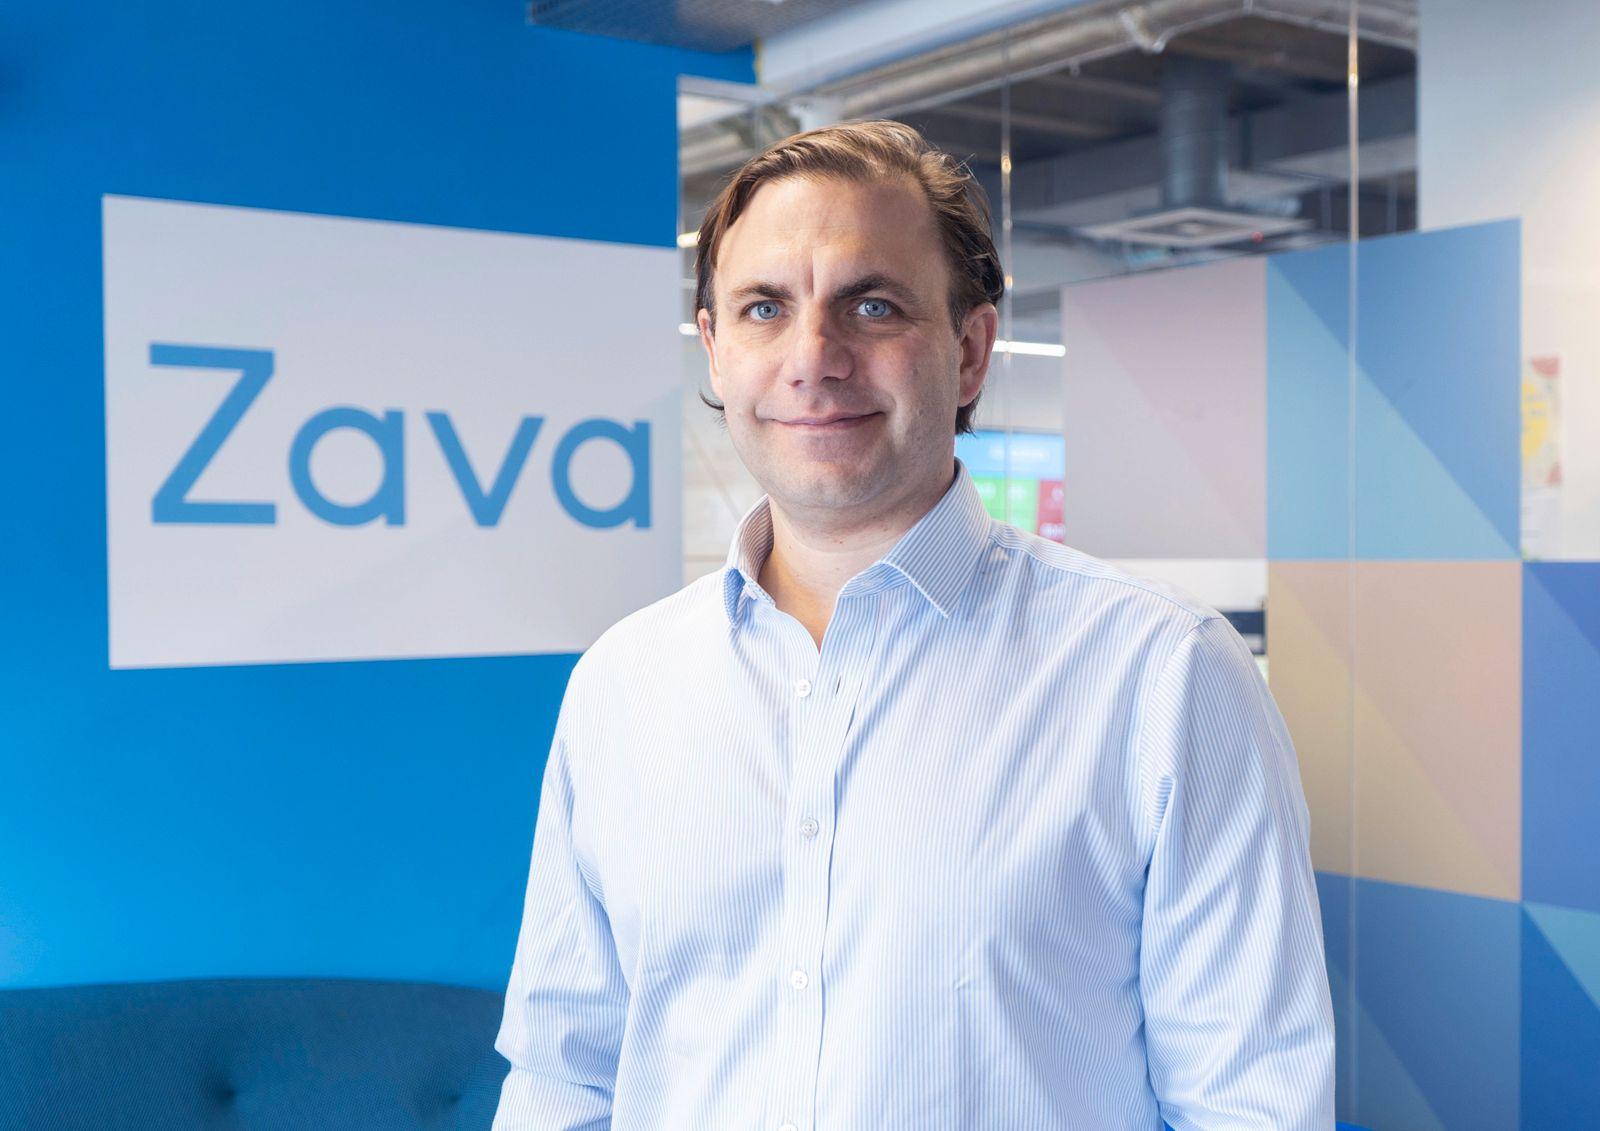 David Meinertz / Zava